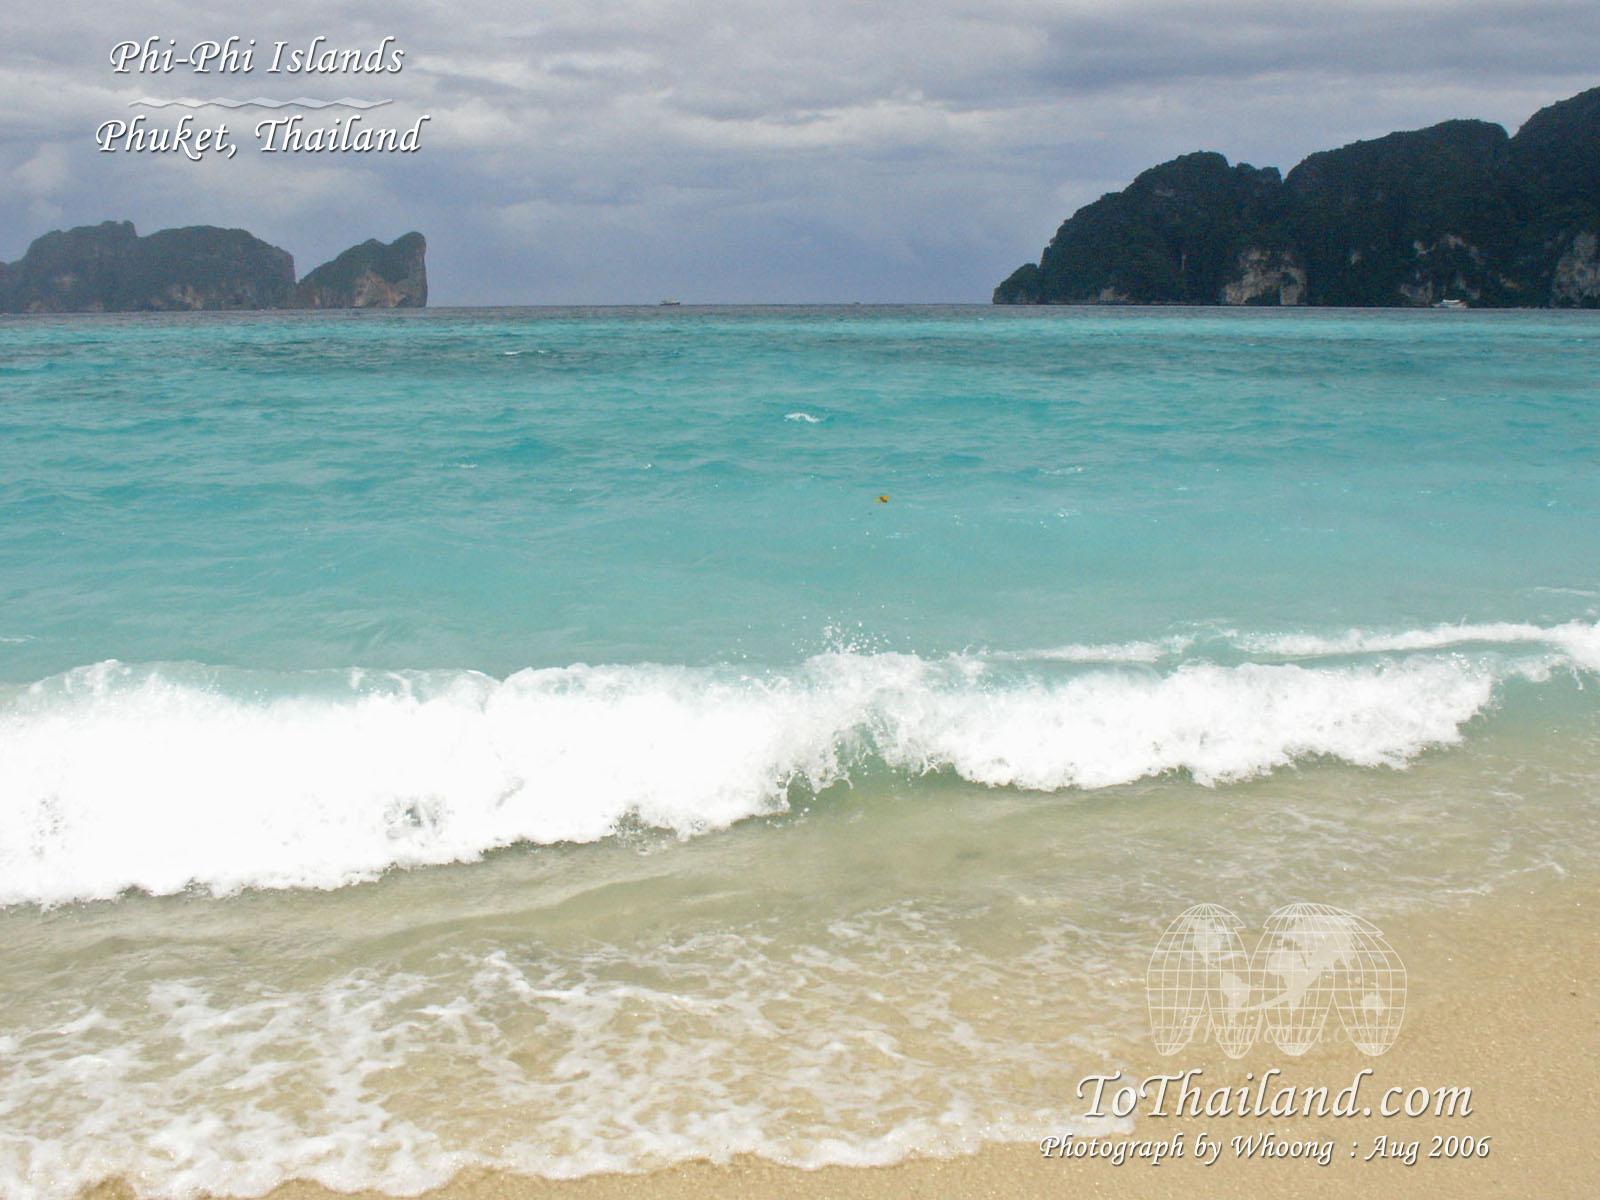 Phuket Thailand wallpaper | Desinow's Blog